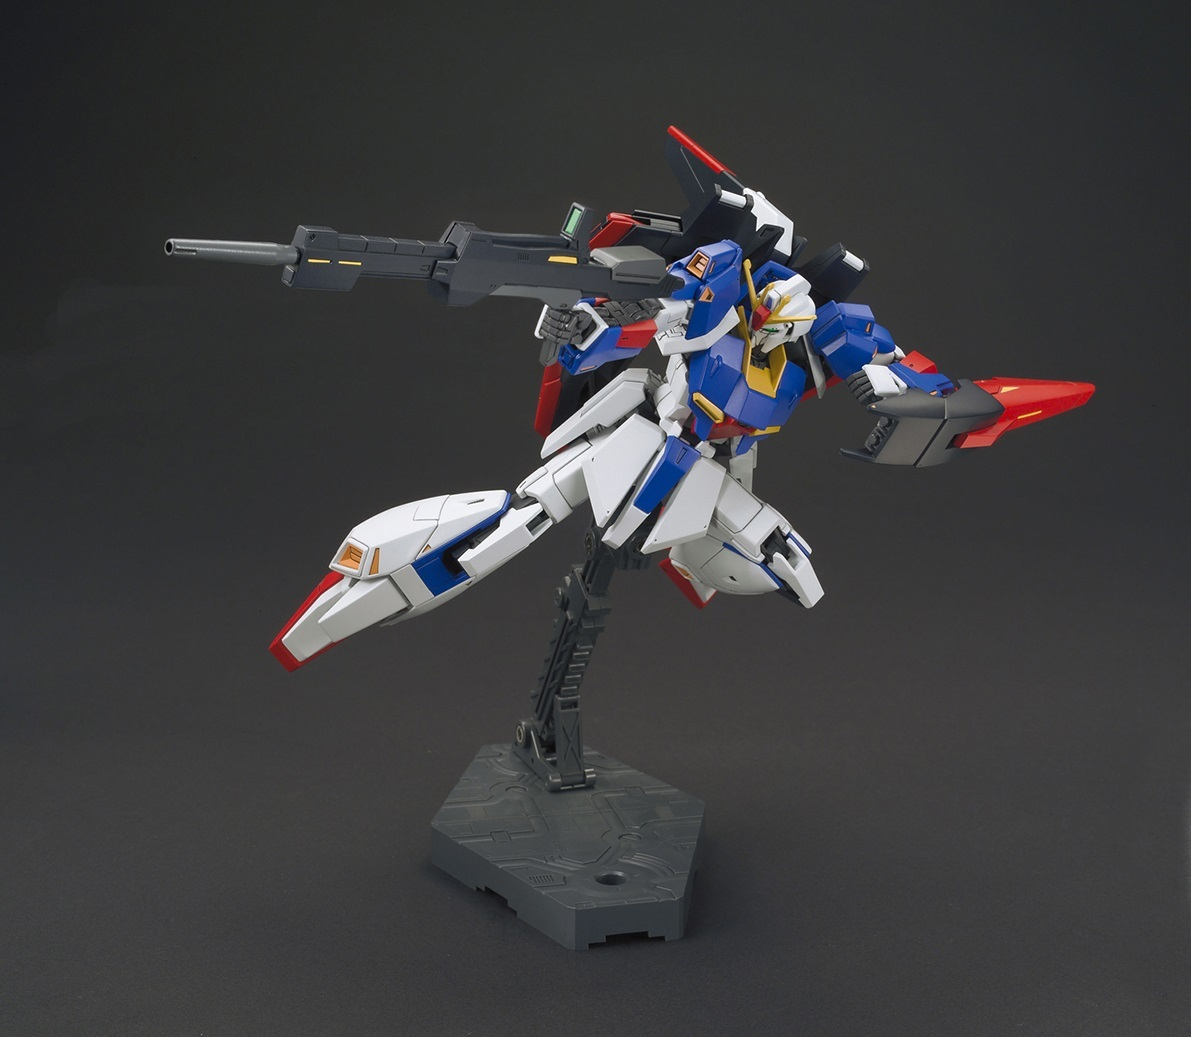 HGUC 1/144 Zeta Gundam - Model Kit (Gunpla Evolution Project) image